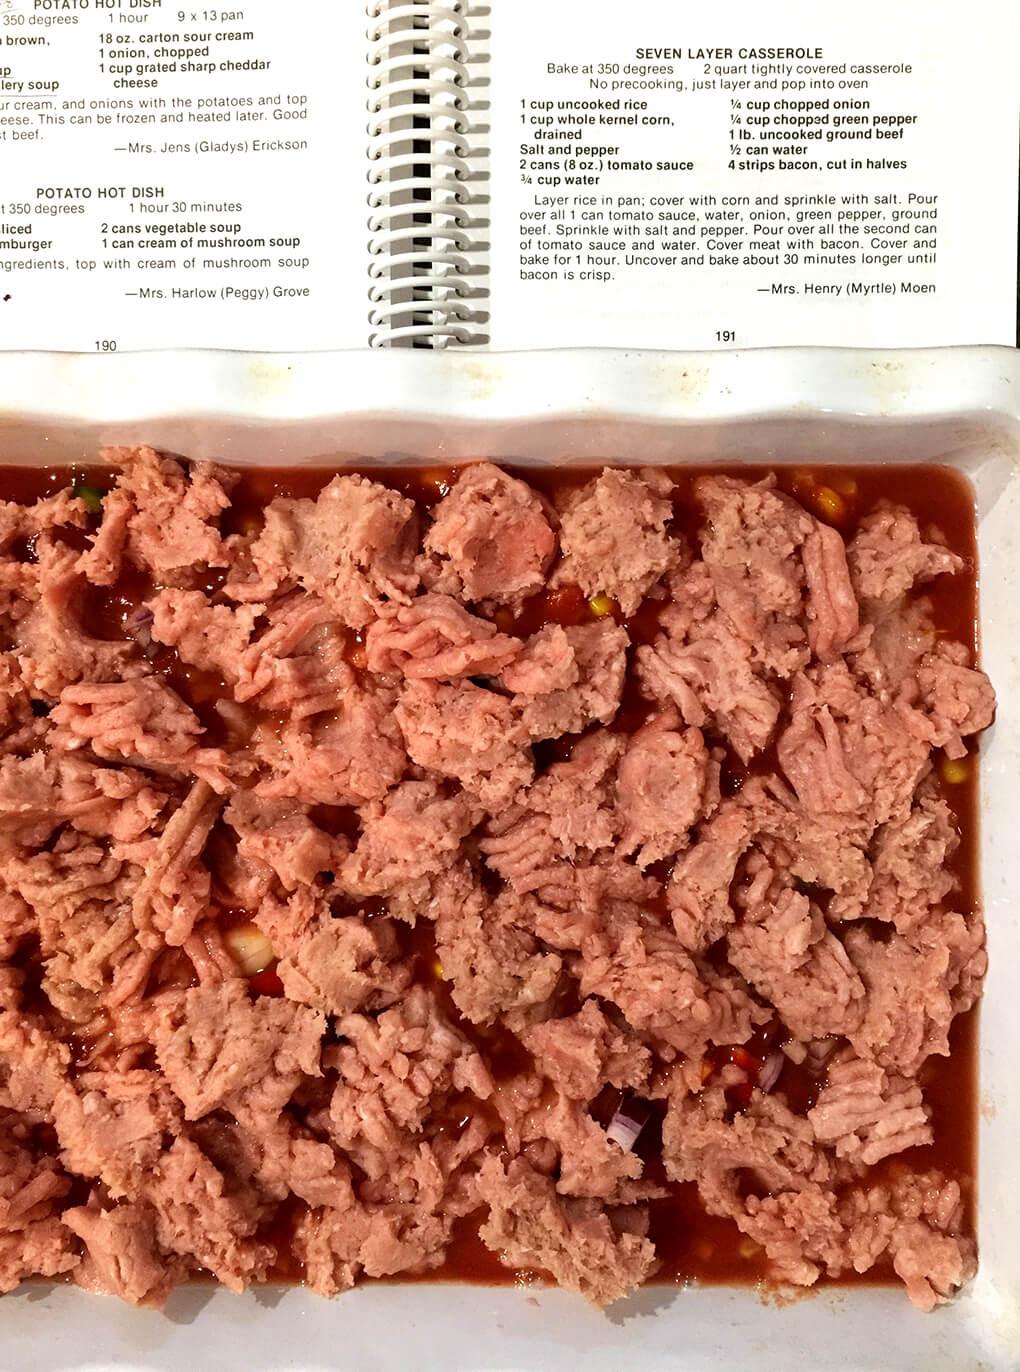 Seven Layer Casserole sarahkayhoffman.com Healthy Pantry